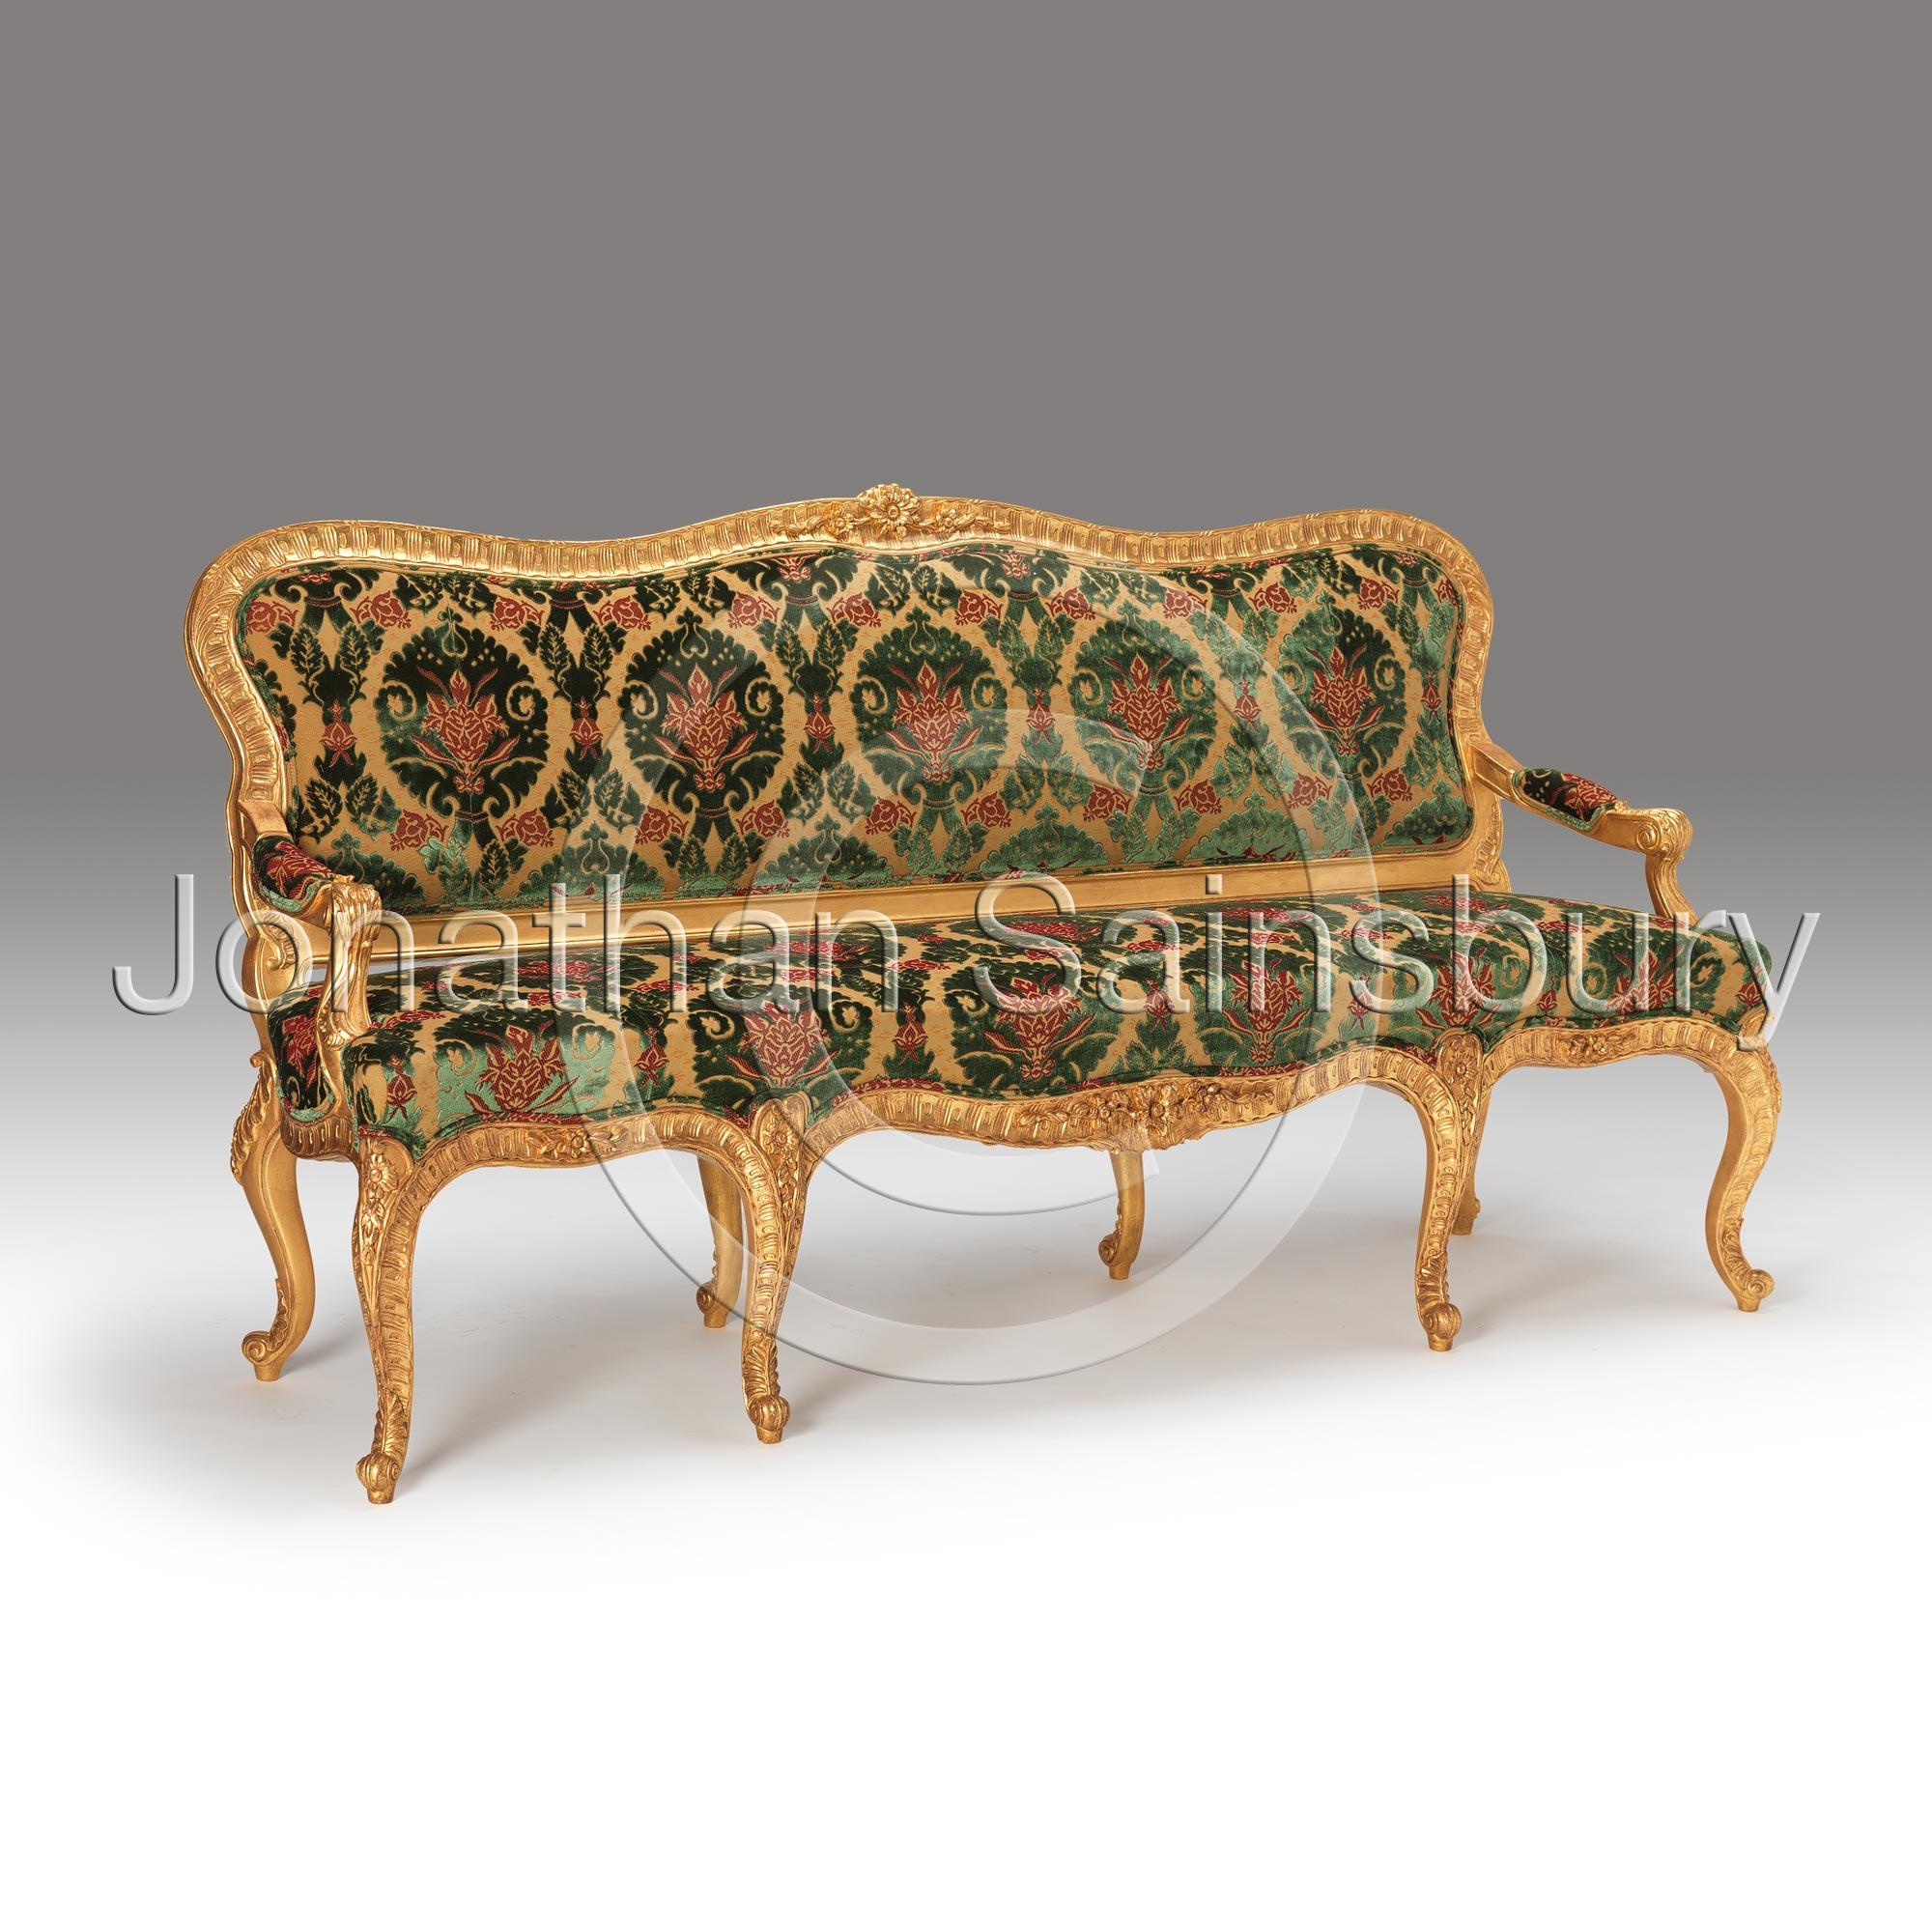 polesden lacey sofa jonathan sainsbury. Black Bedroom Furniture Sets. Home Design Ideas